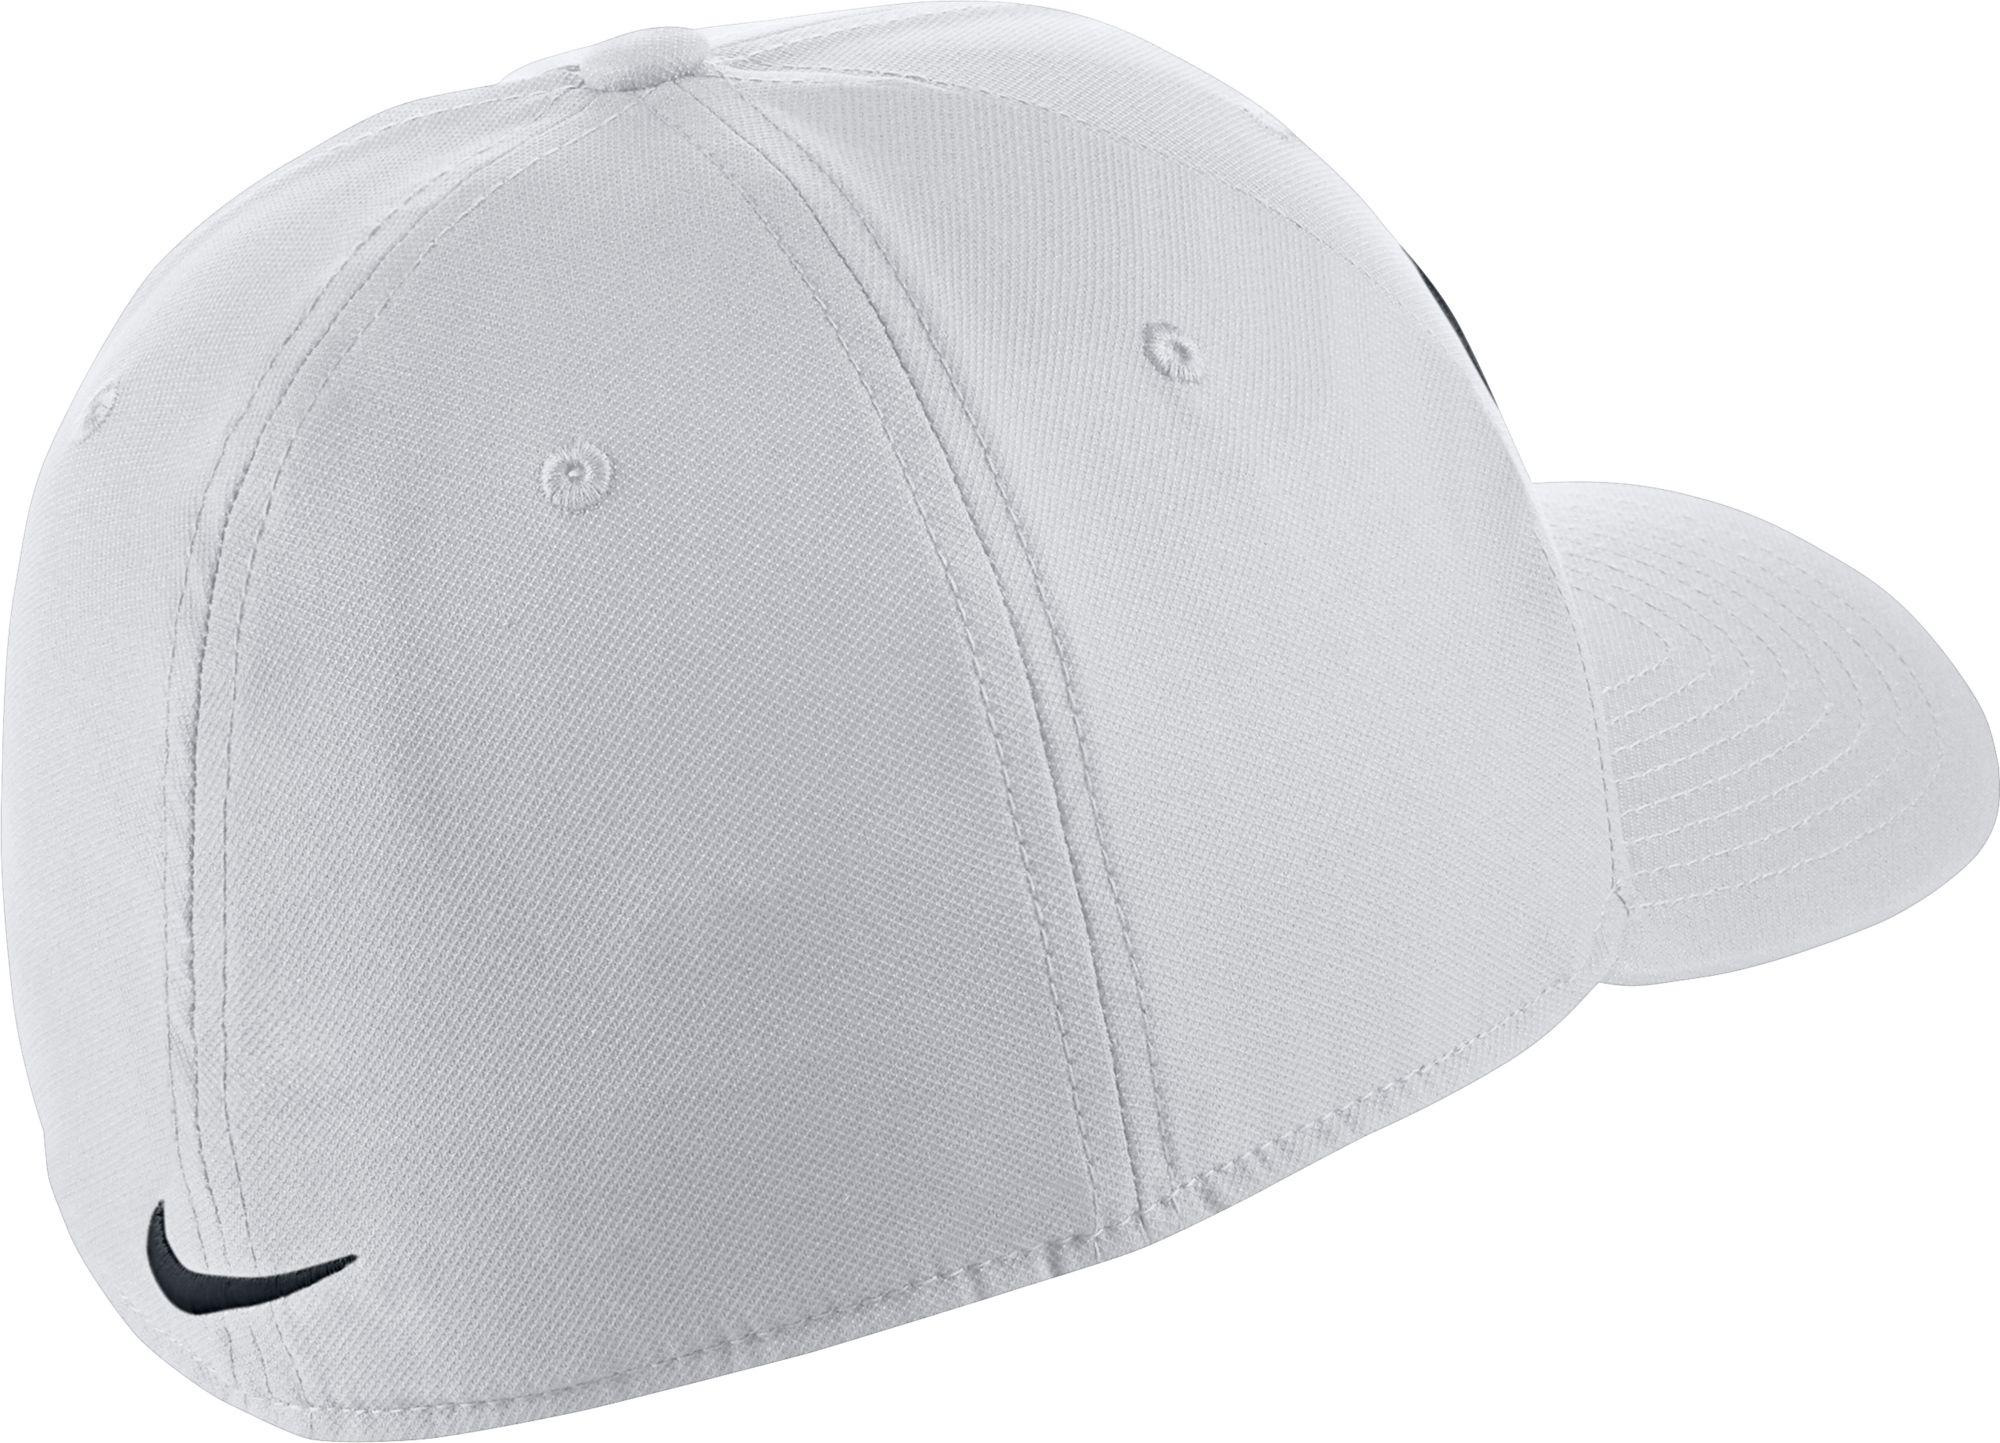 fc5de41b070 ... Classic99 Swoosh Golf Hat for Men - Lyst. View fullscreen